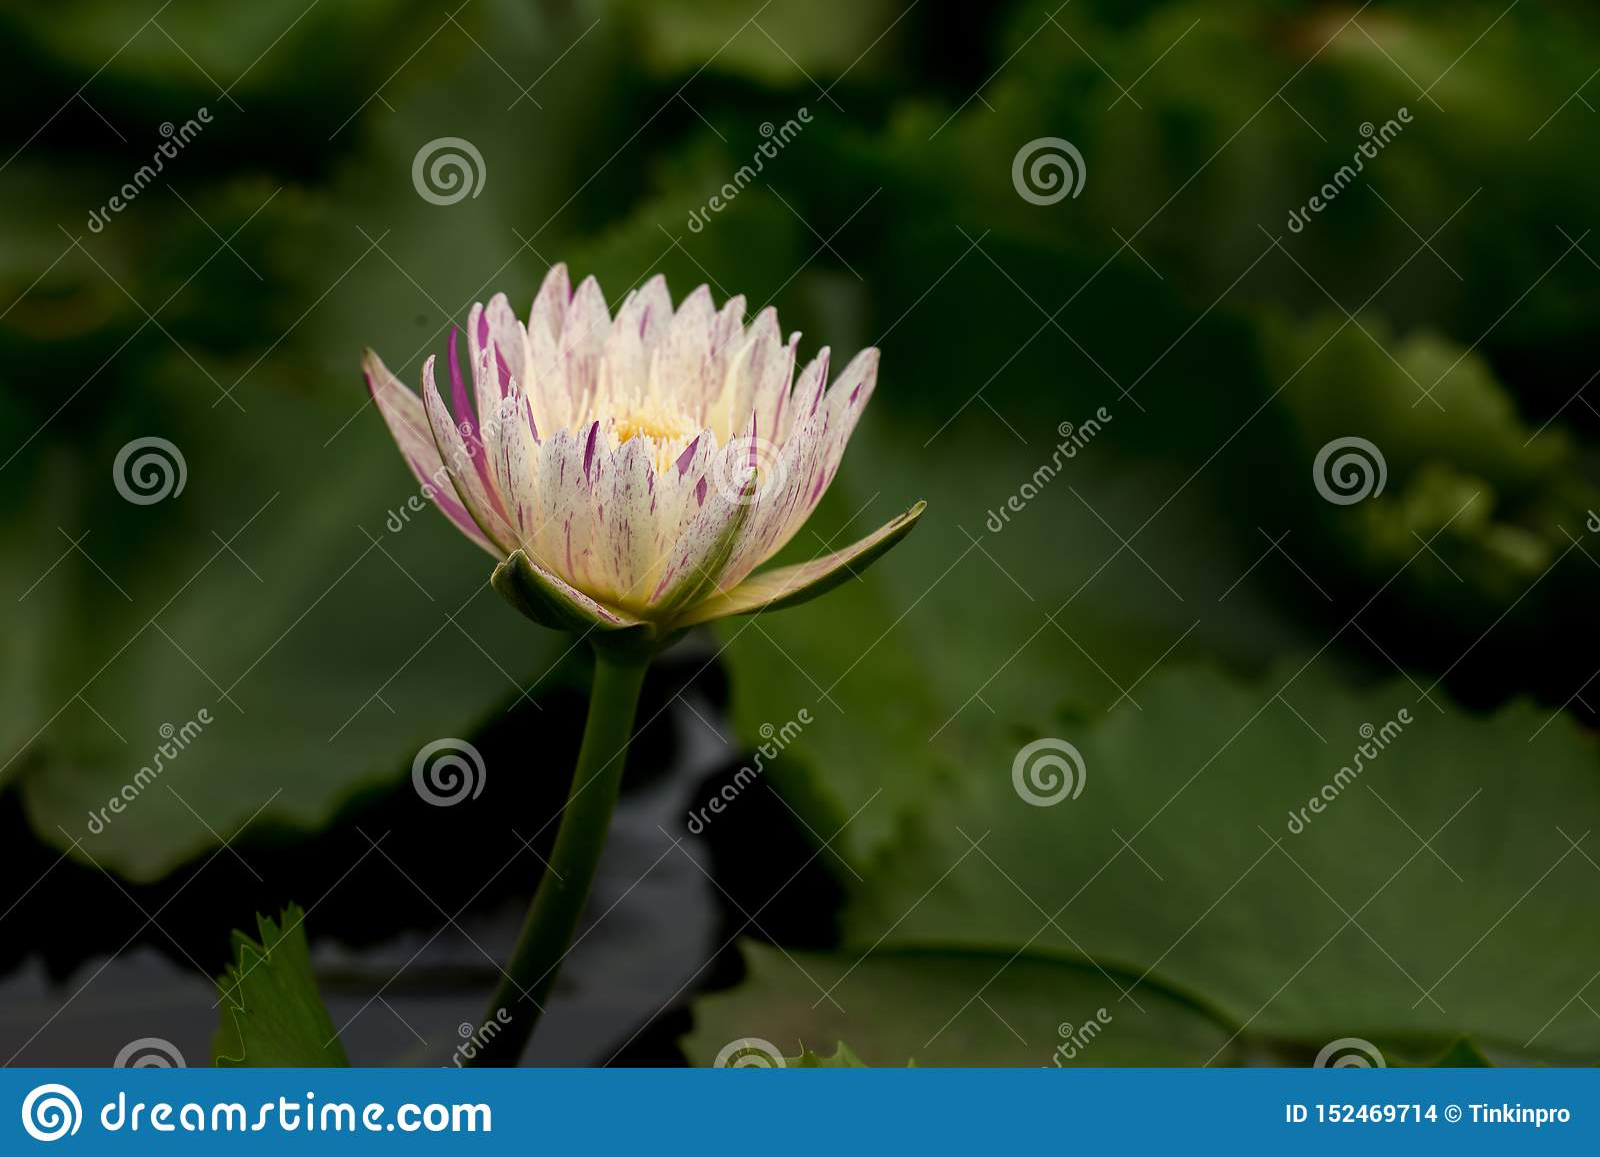 Wanter, Flower, Close Up, Plant, Purple, Purple Lily, Purple Teichrose, Purple Flower, Violet, Purple Water Lily